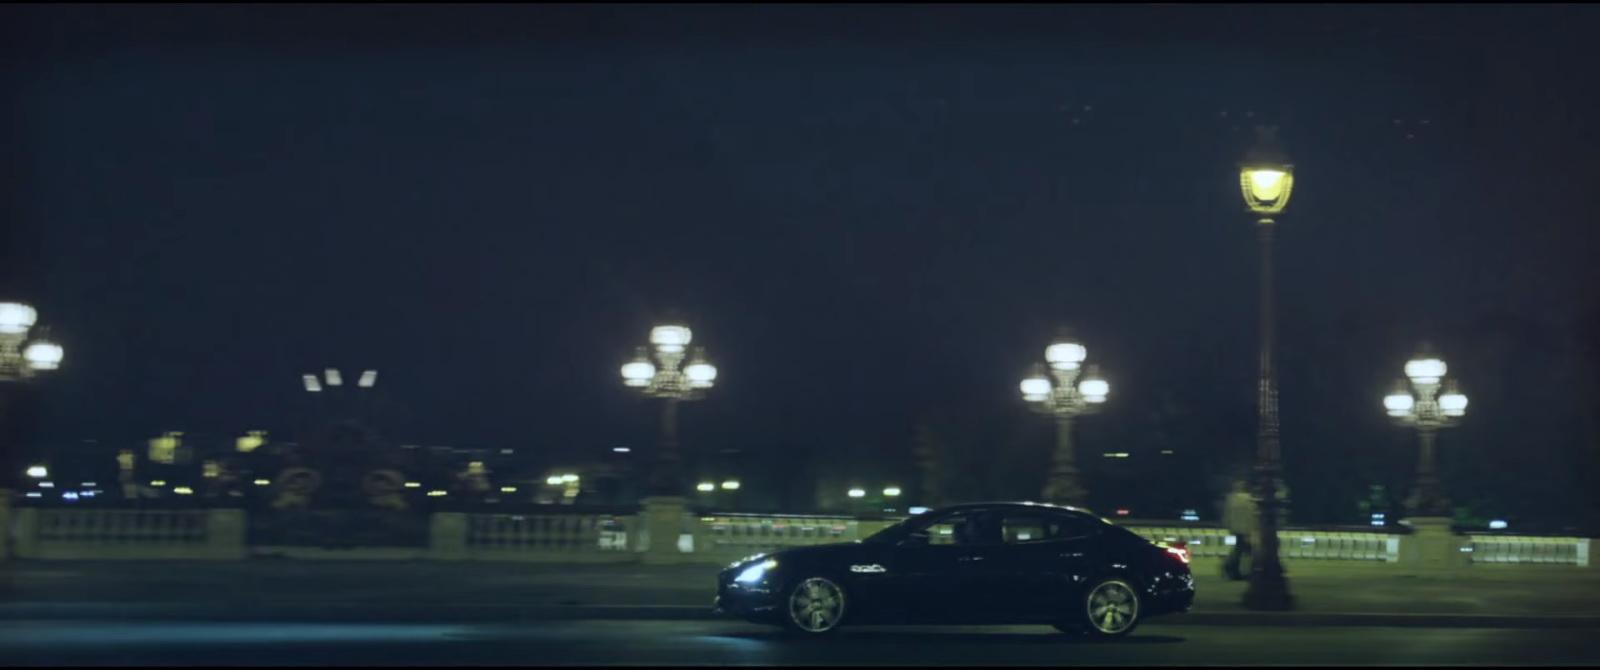 Maserati Quattroporte - Mylène Farmer & Sting - Stolen Car (12)